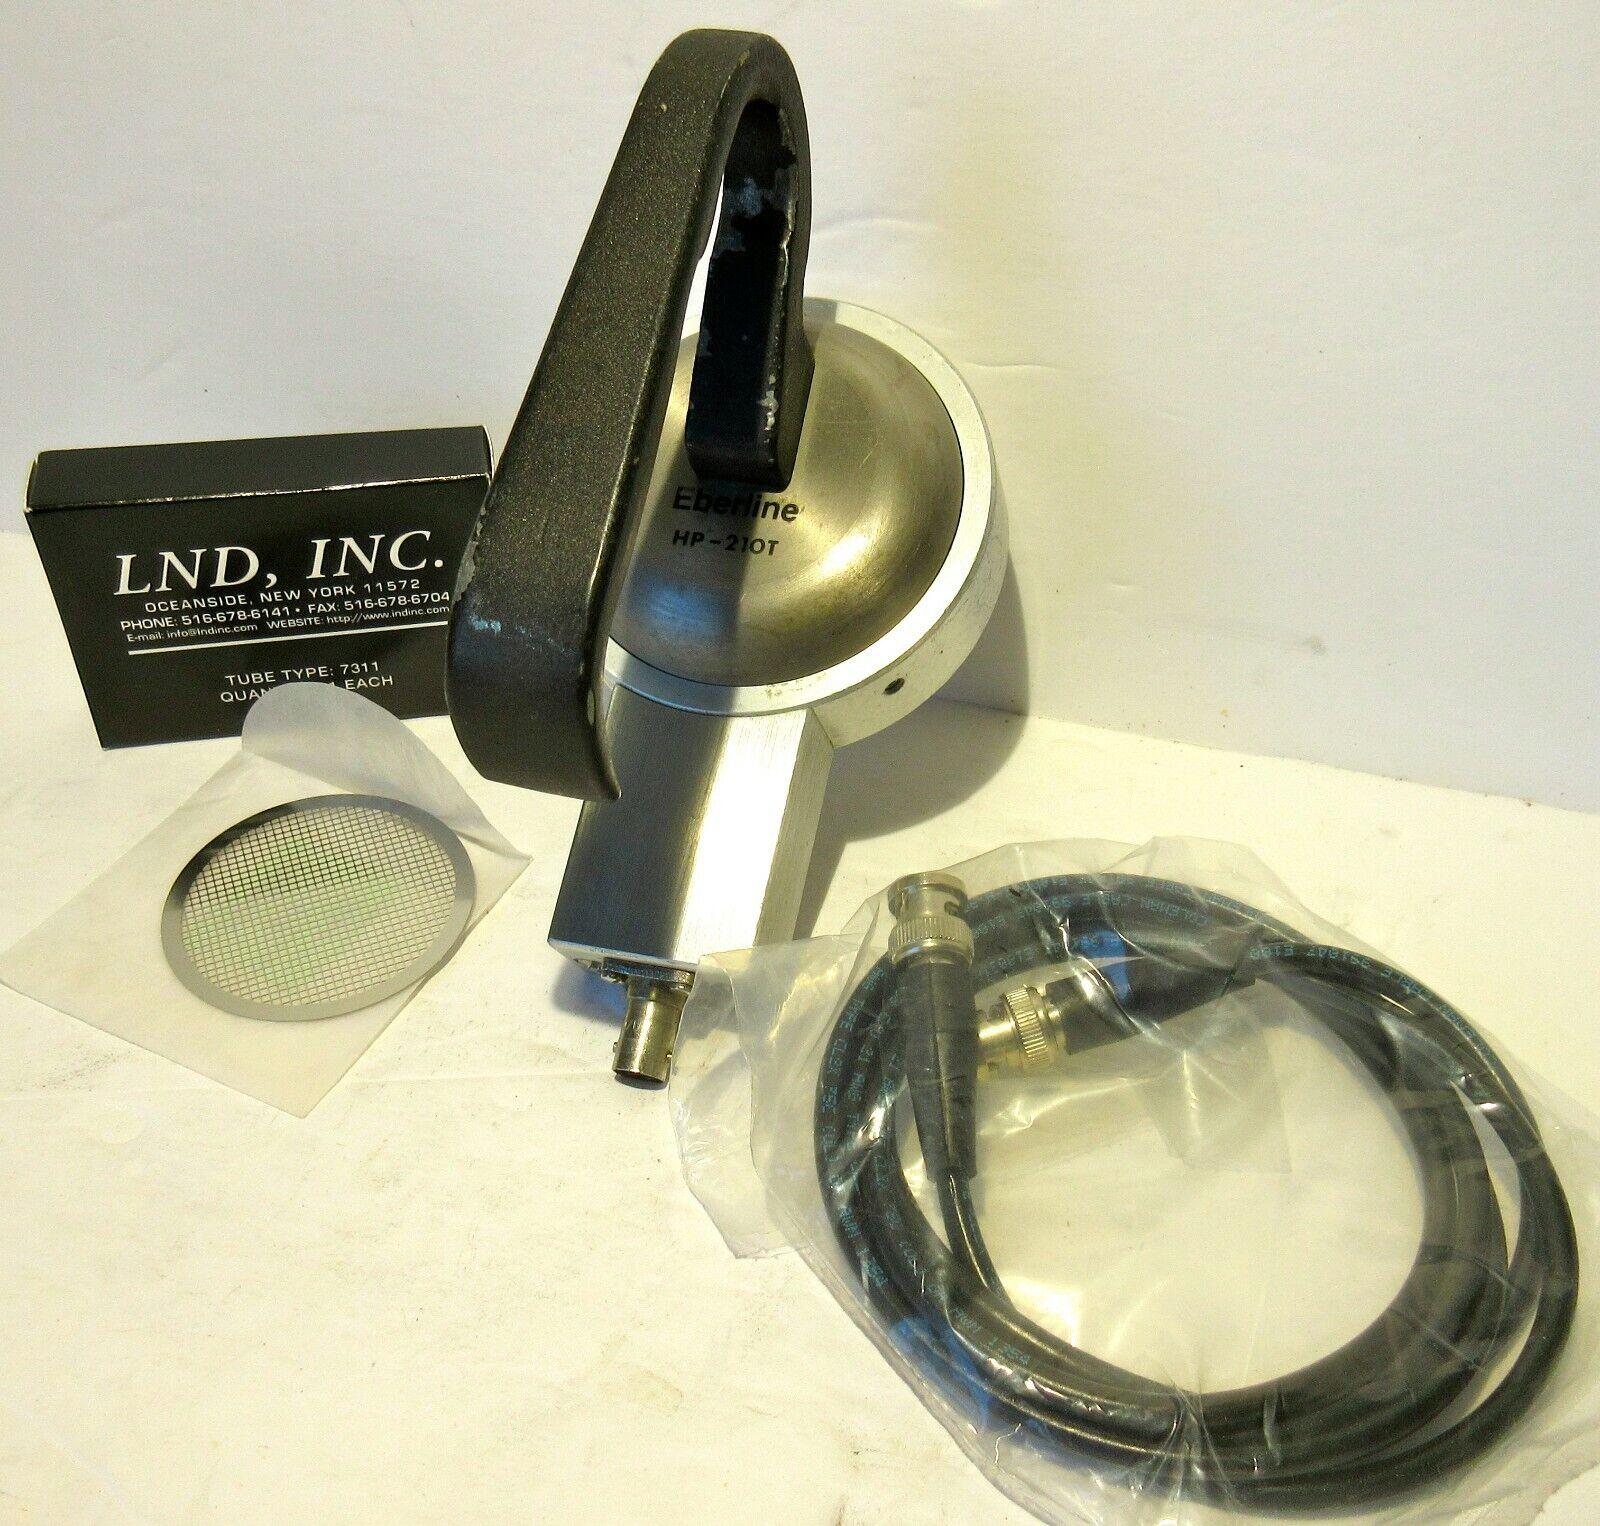 s l1600 - Eberline HP-210 shielded probe and accessories